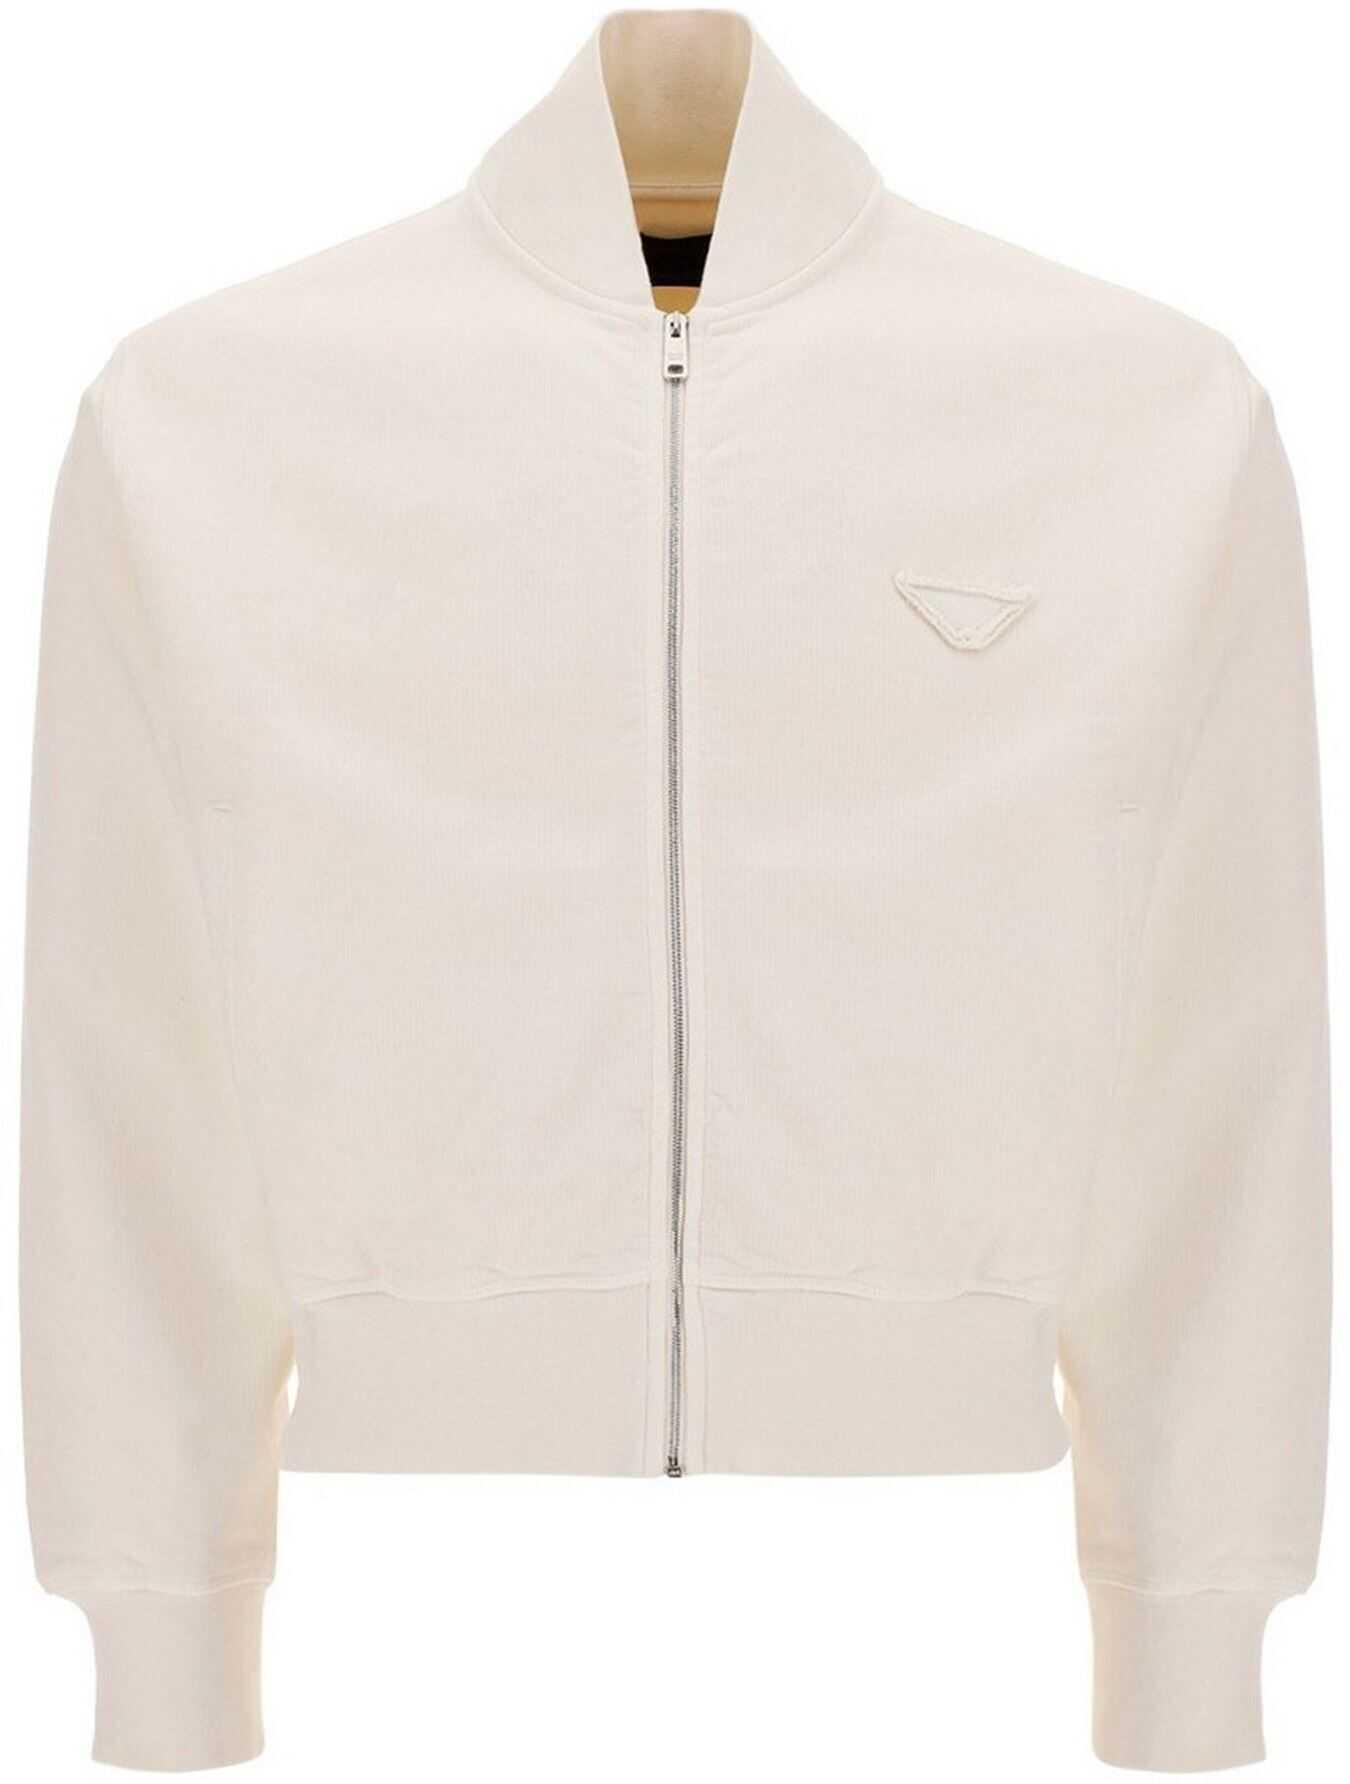 Prada Zipped Jersey Cotton Cardigan In White White imagine